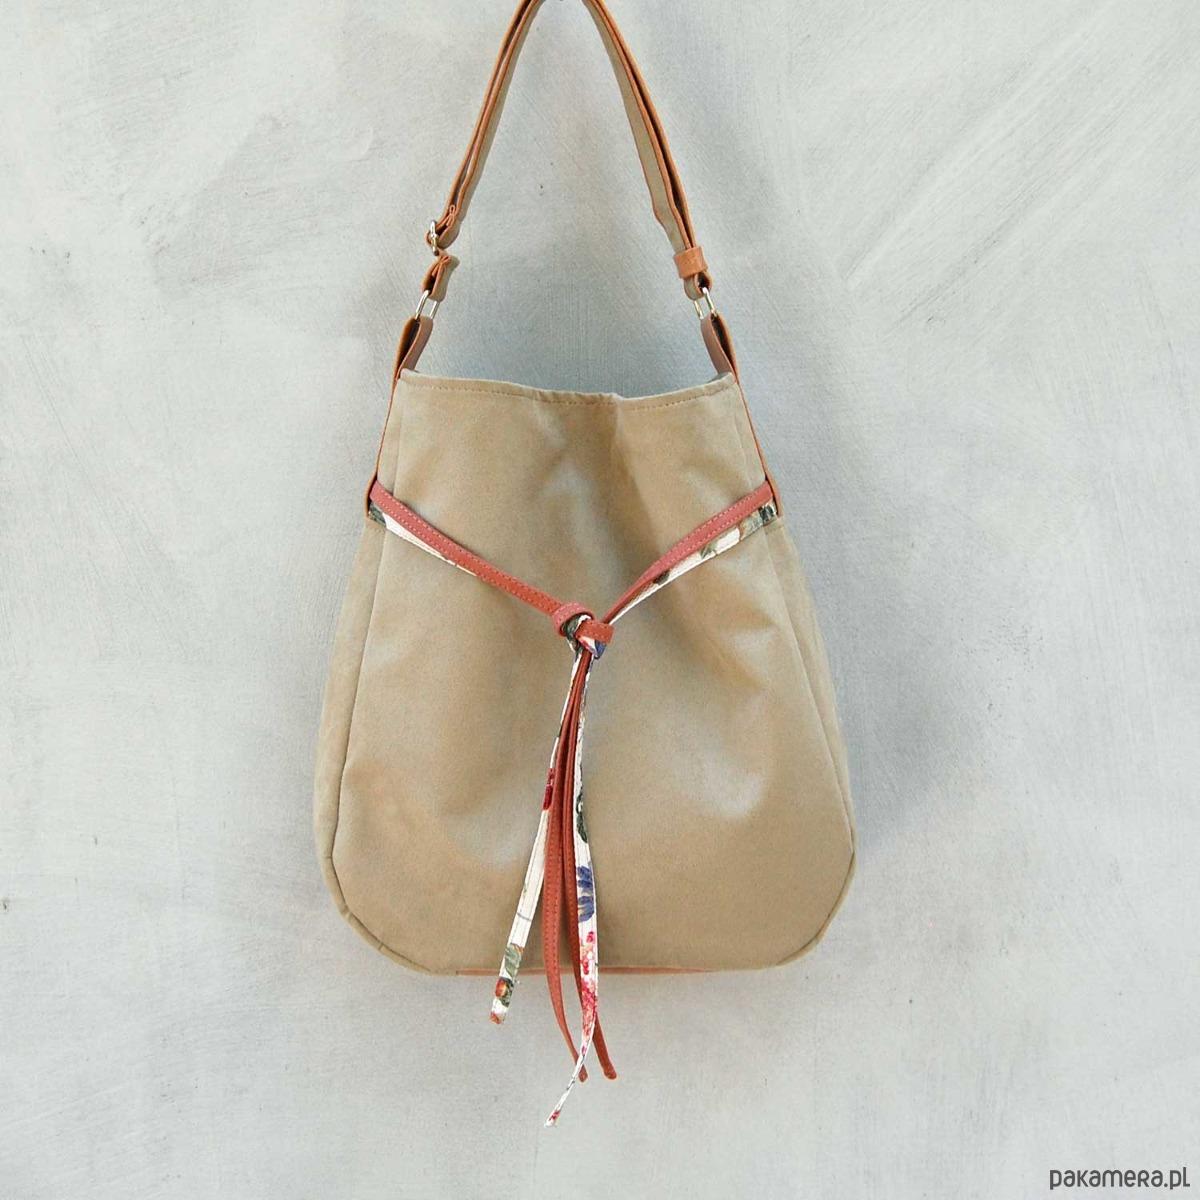 d6eabc1819989 SIMPLY BAG - duża torba worek - oliwka - torby na ramię - damskie ...